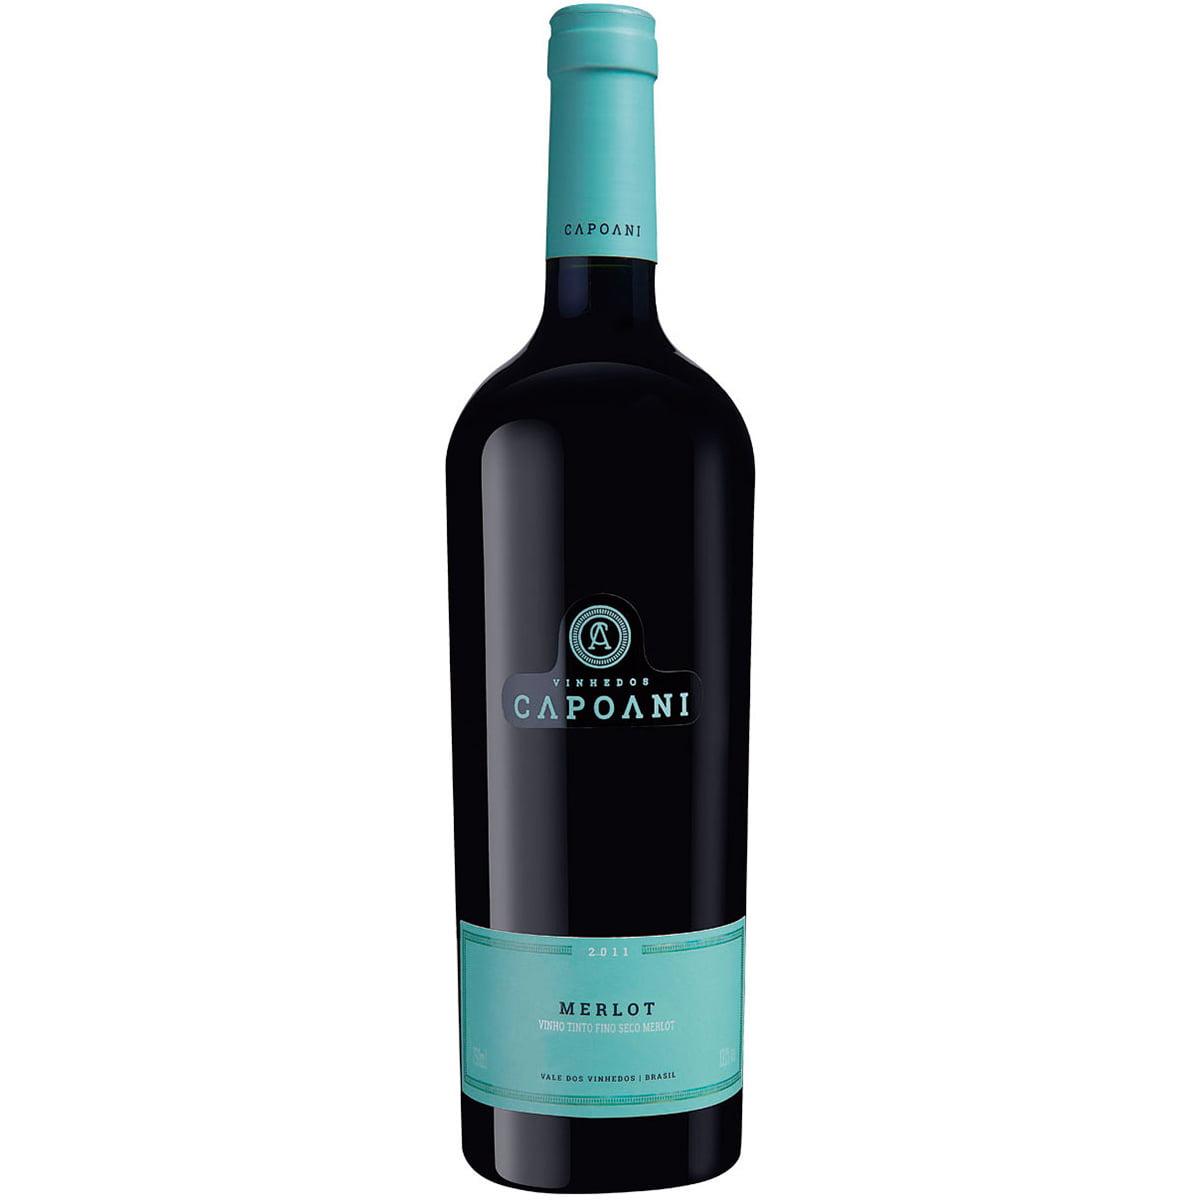 Vinho Capoani Merlot Tinto Seco 750ml